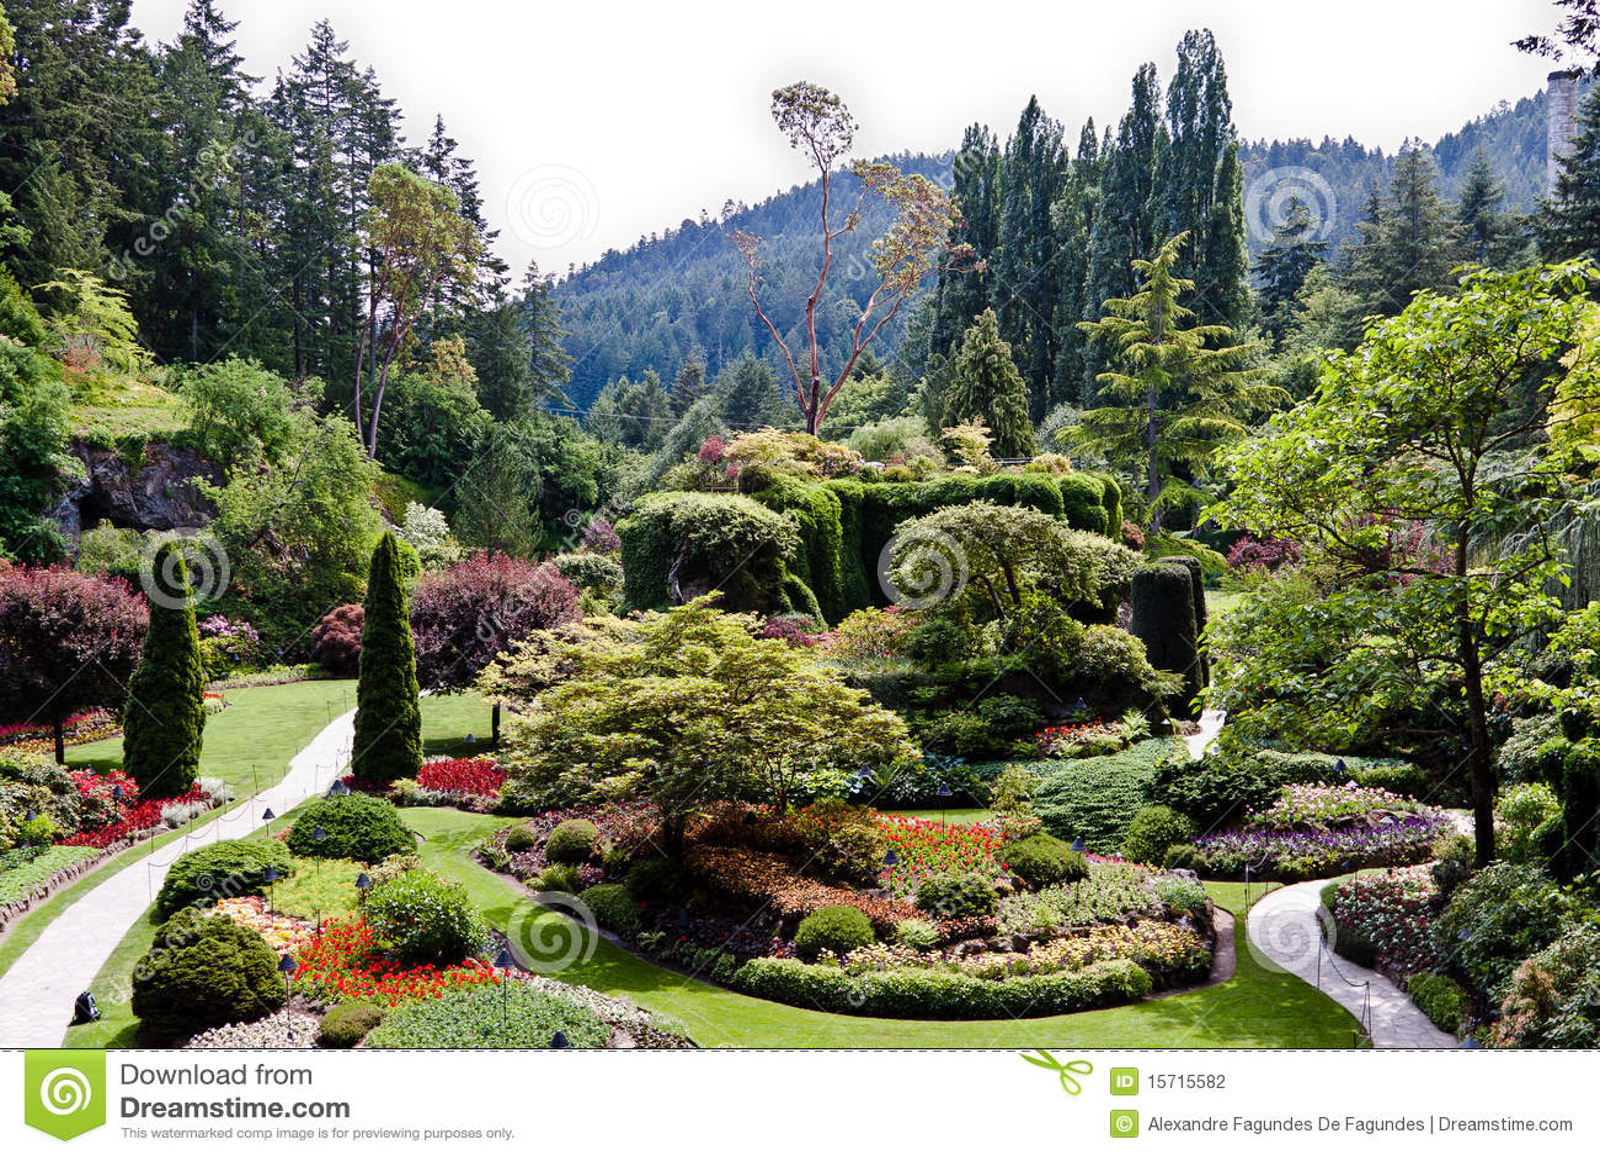 Jardins de butchart en le canada de vancouver for Jardines butchart